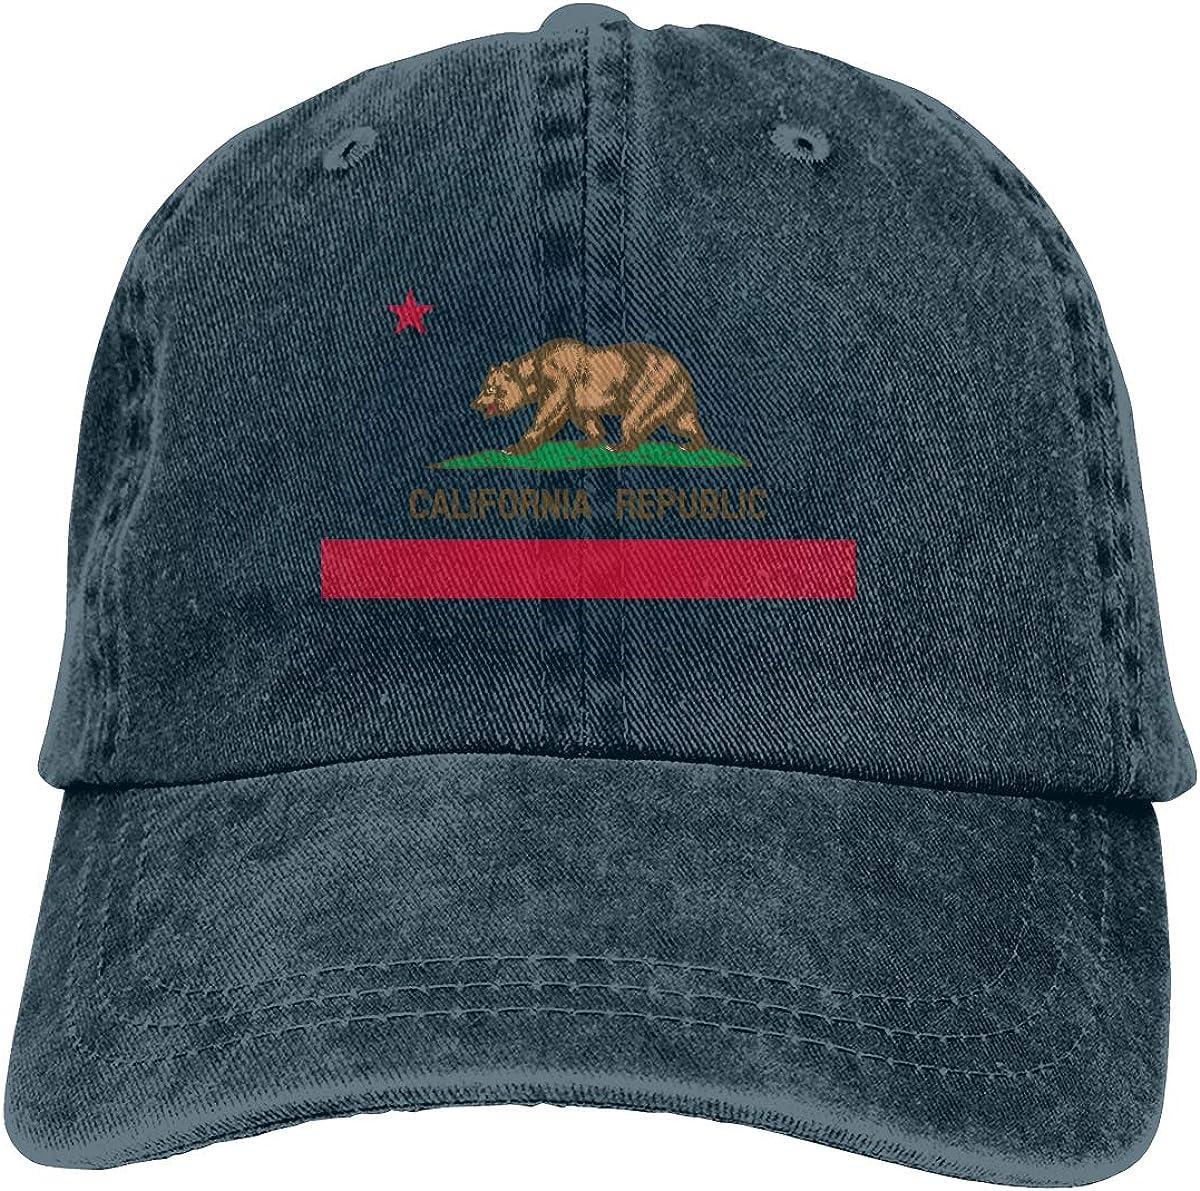 Max 86% OFF Denim Cap California Flag Dad Caps S OFFicial mail order Baseball Adjustable Classic